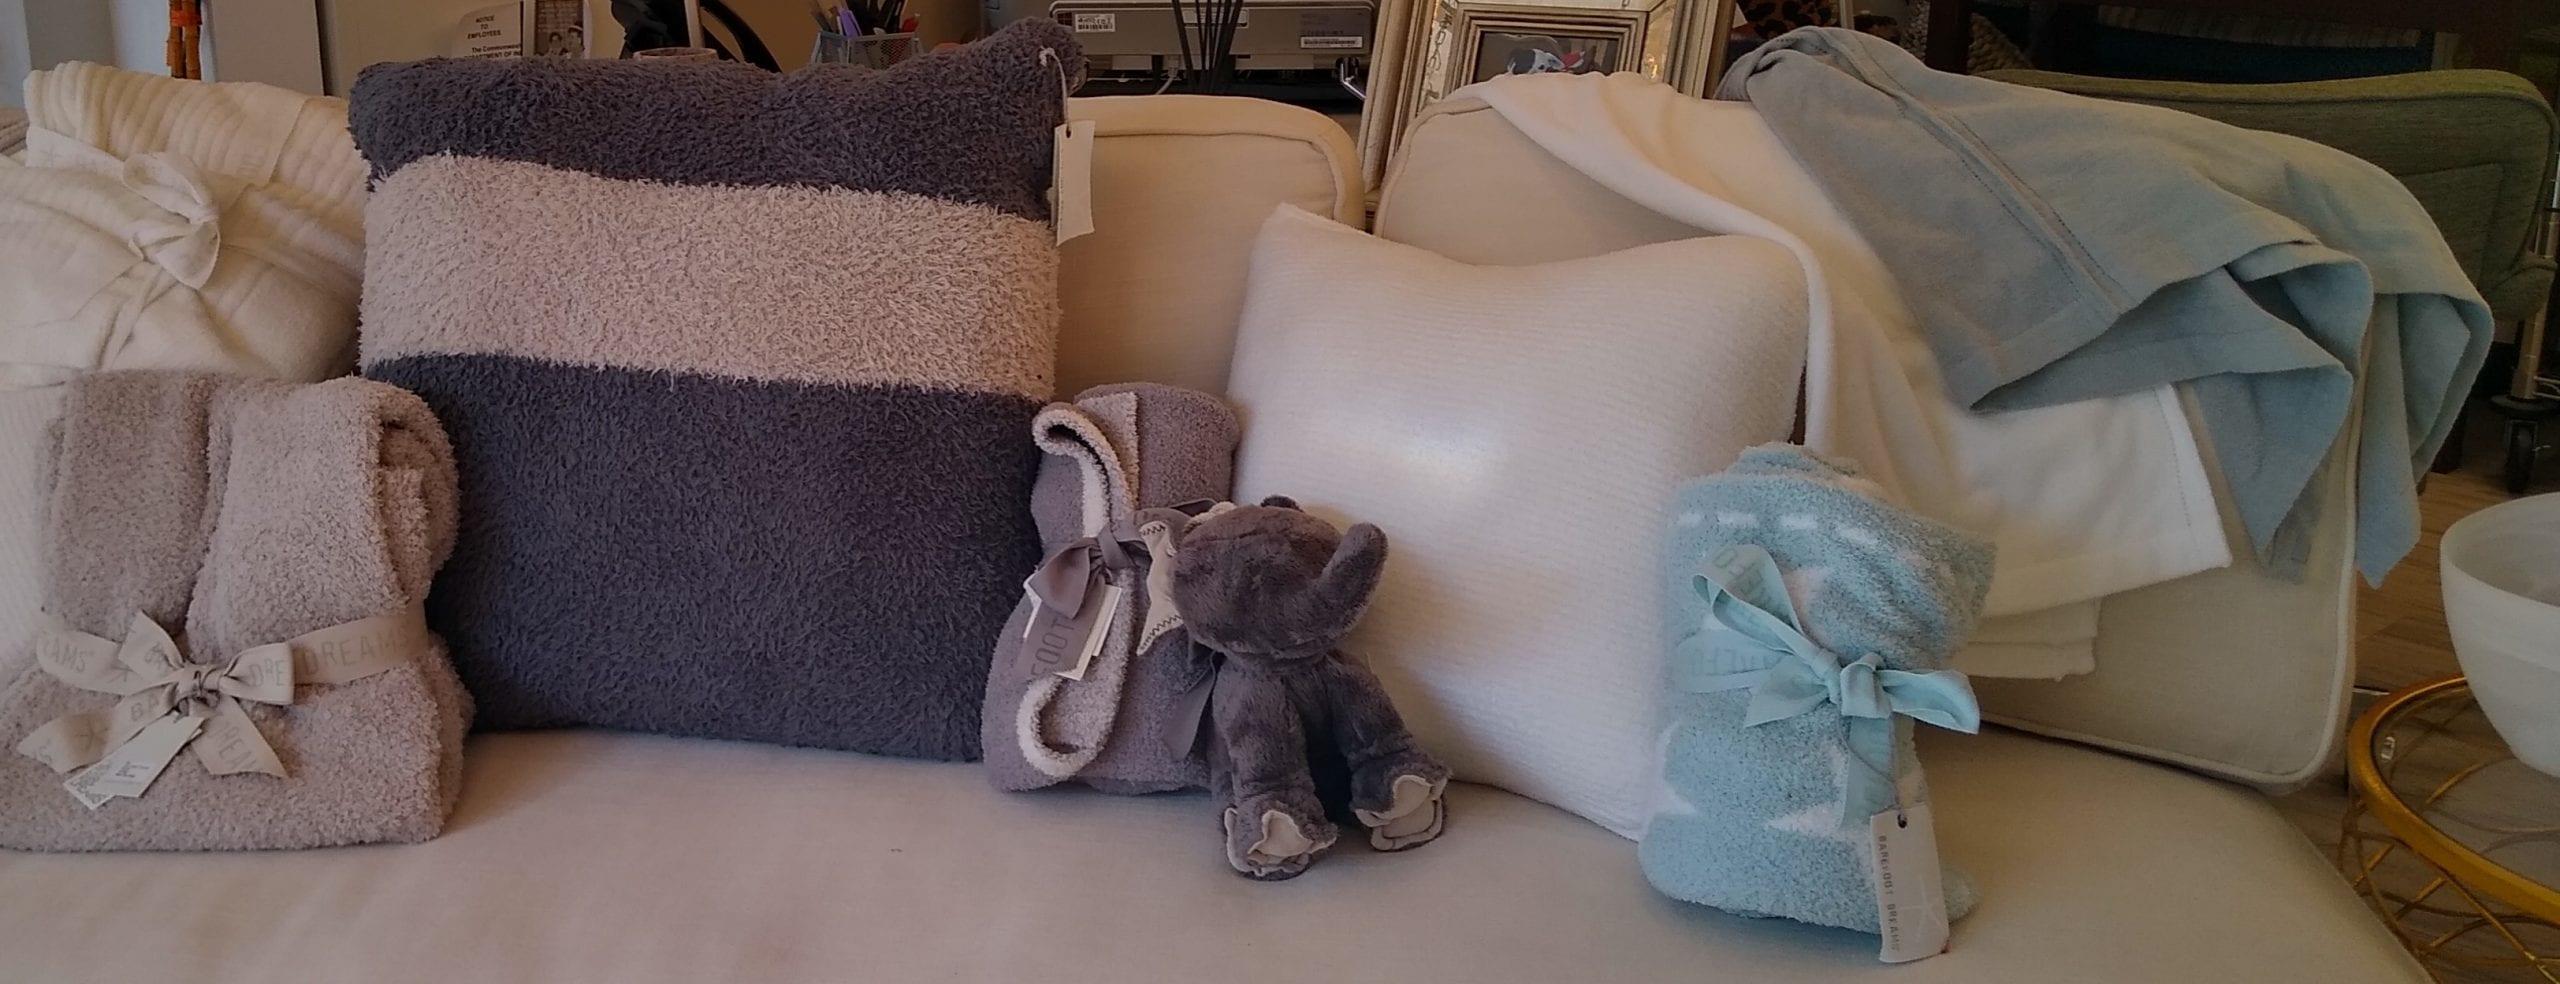 Throw Pillows & Blankets | Interior Designer | Boston, MA